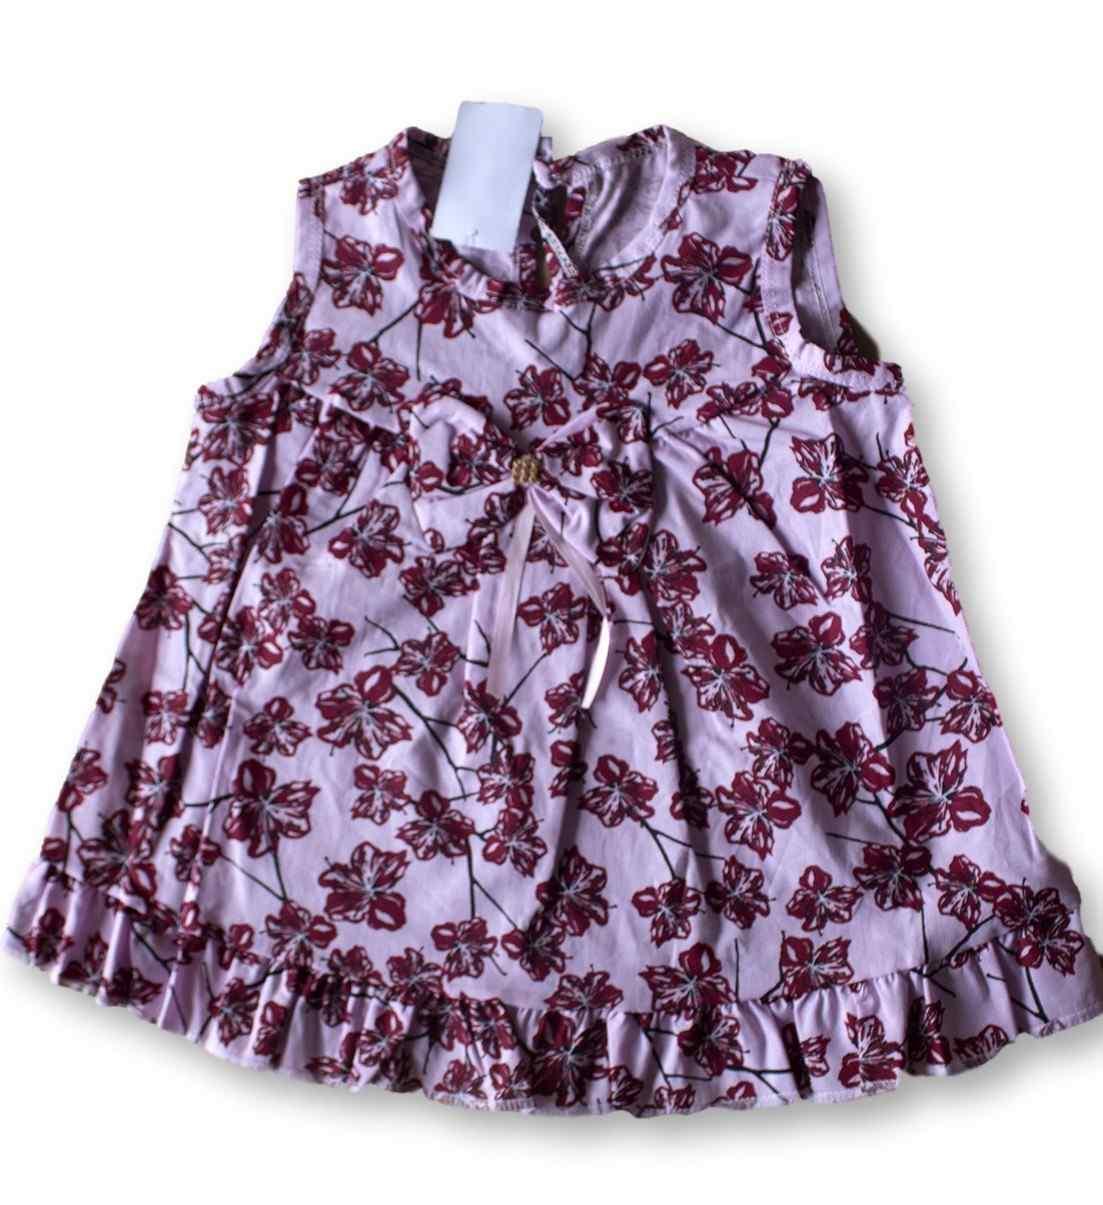 Vestido Bolero Bebê Recém Nascido Feminino Menina Cod 9087